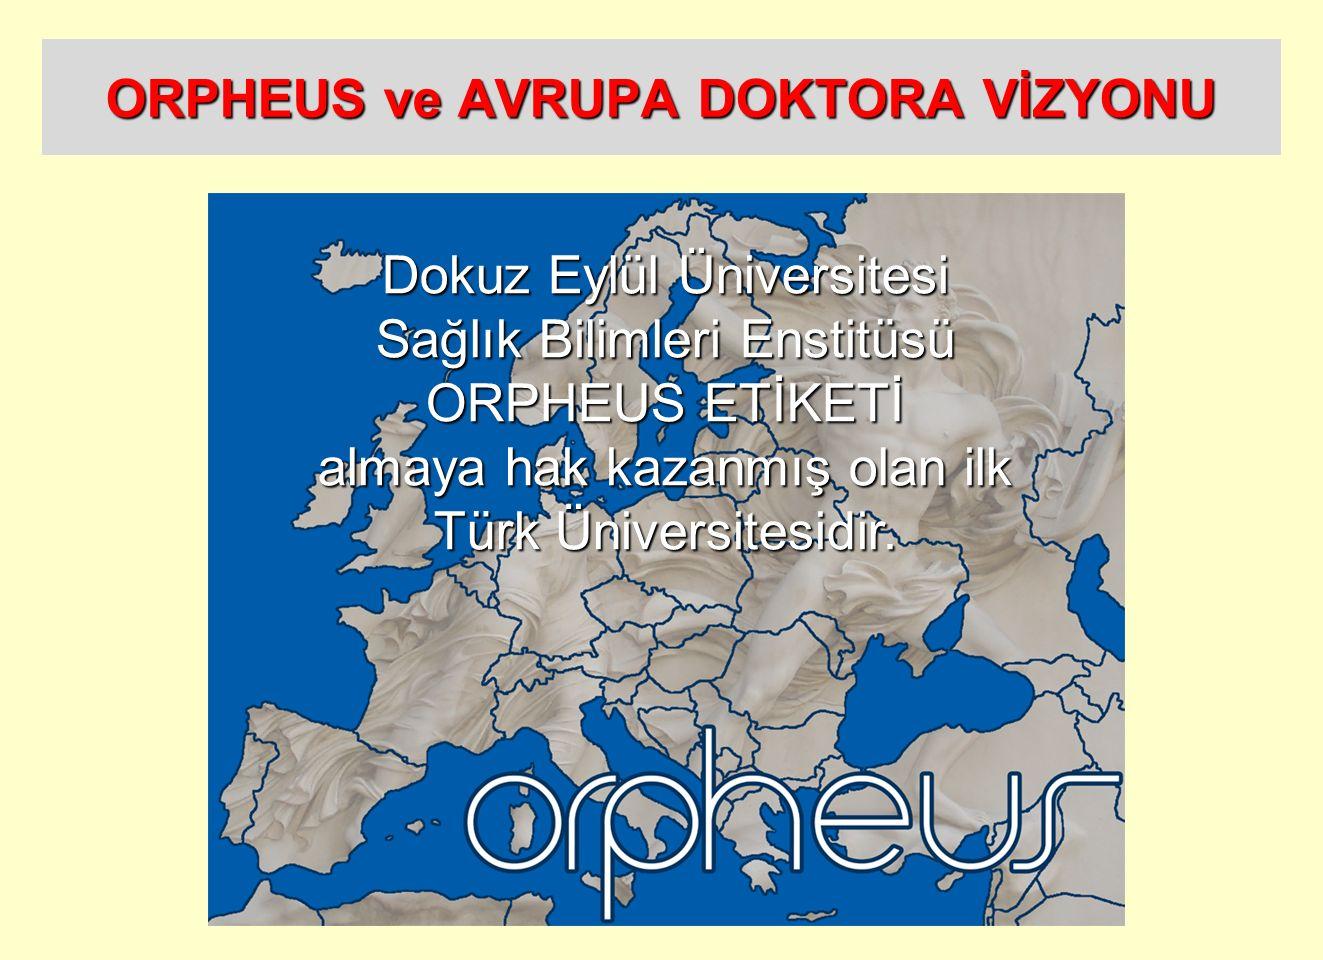 ORPHEUS ve AVRUPA DOKTORA VİZYONU